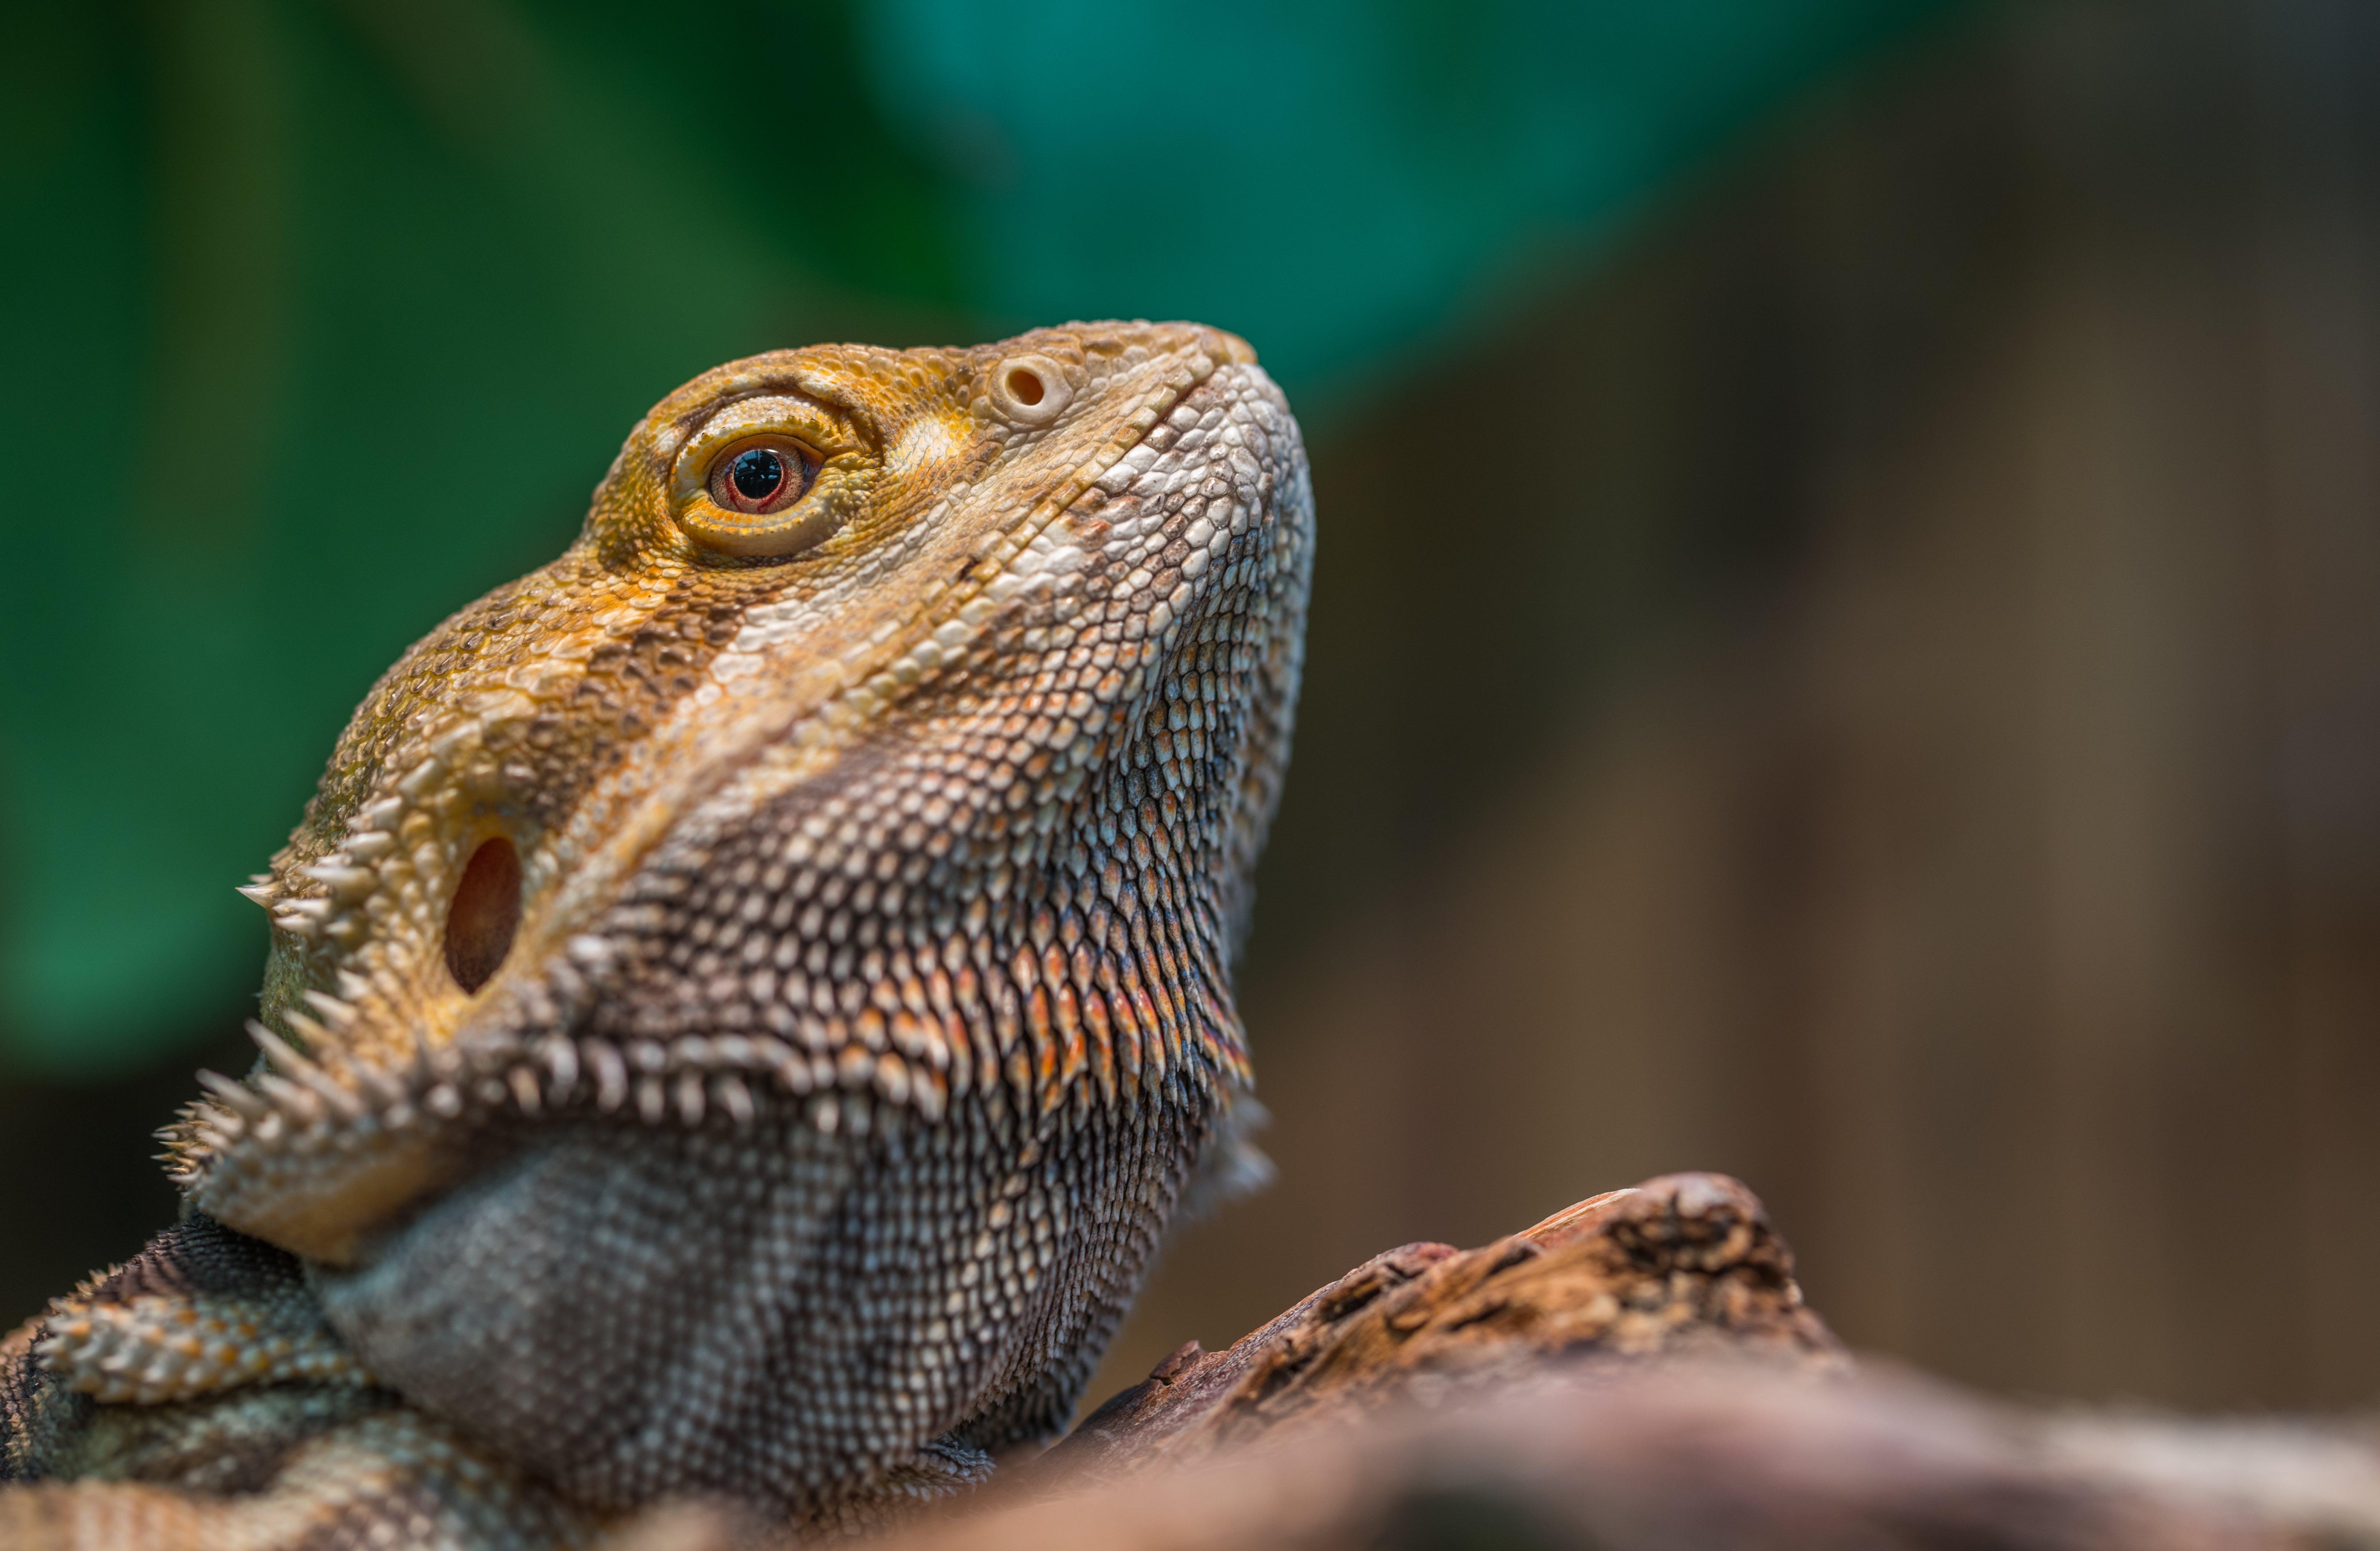 Bearded Dragon Selective Focus Photography